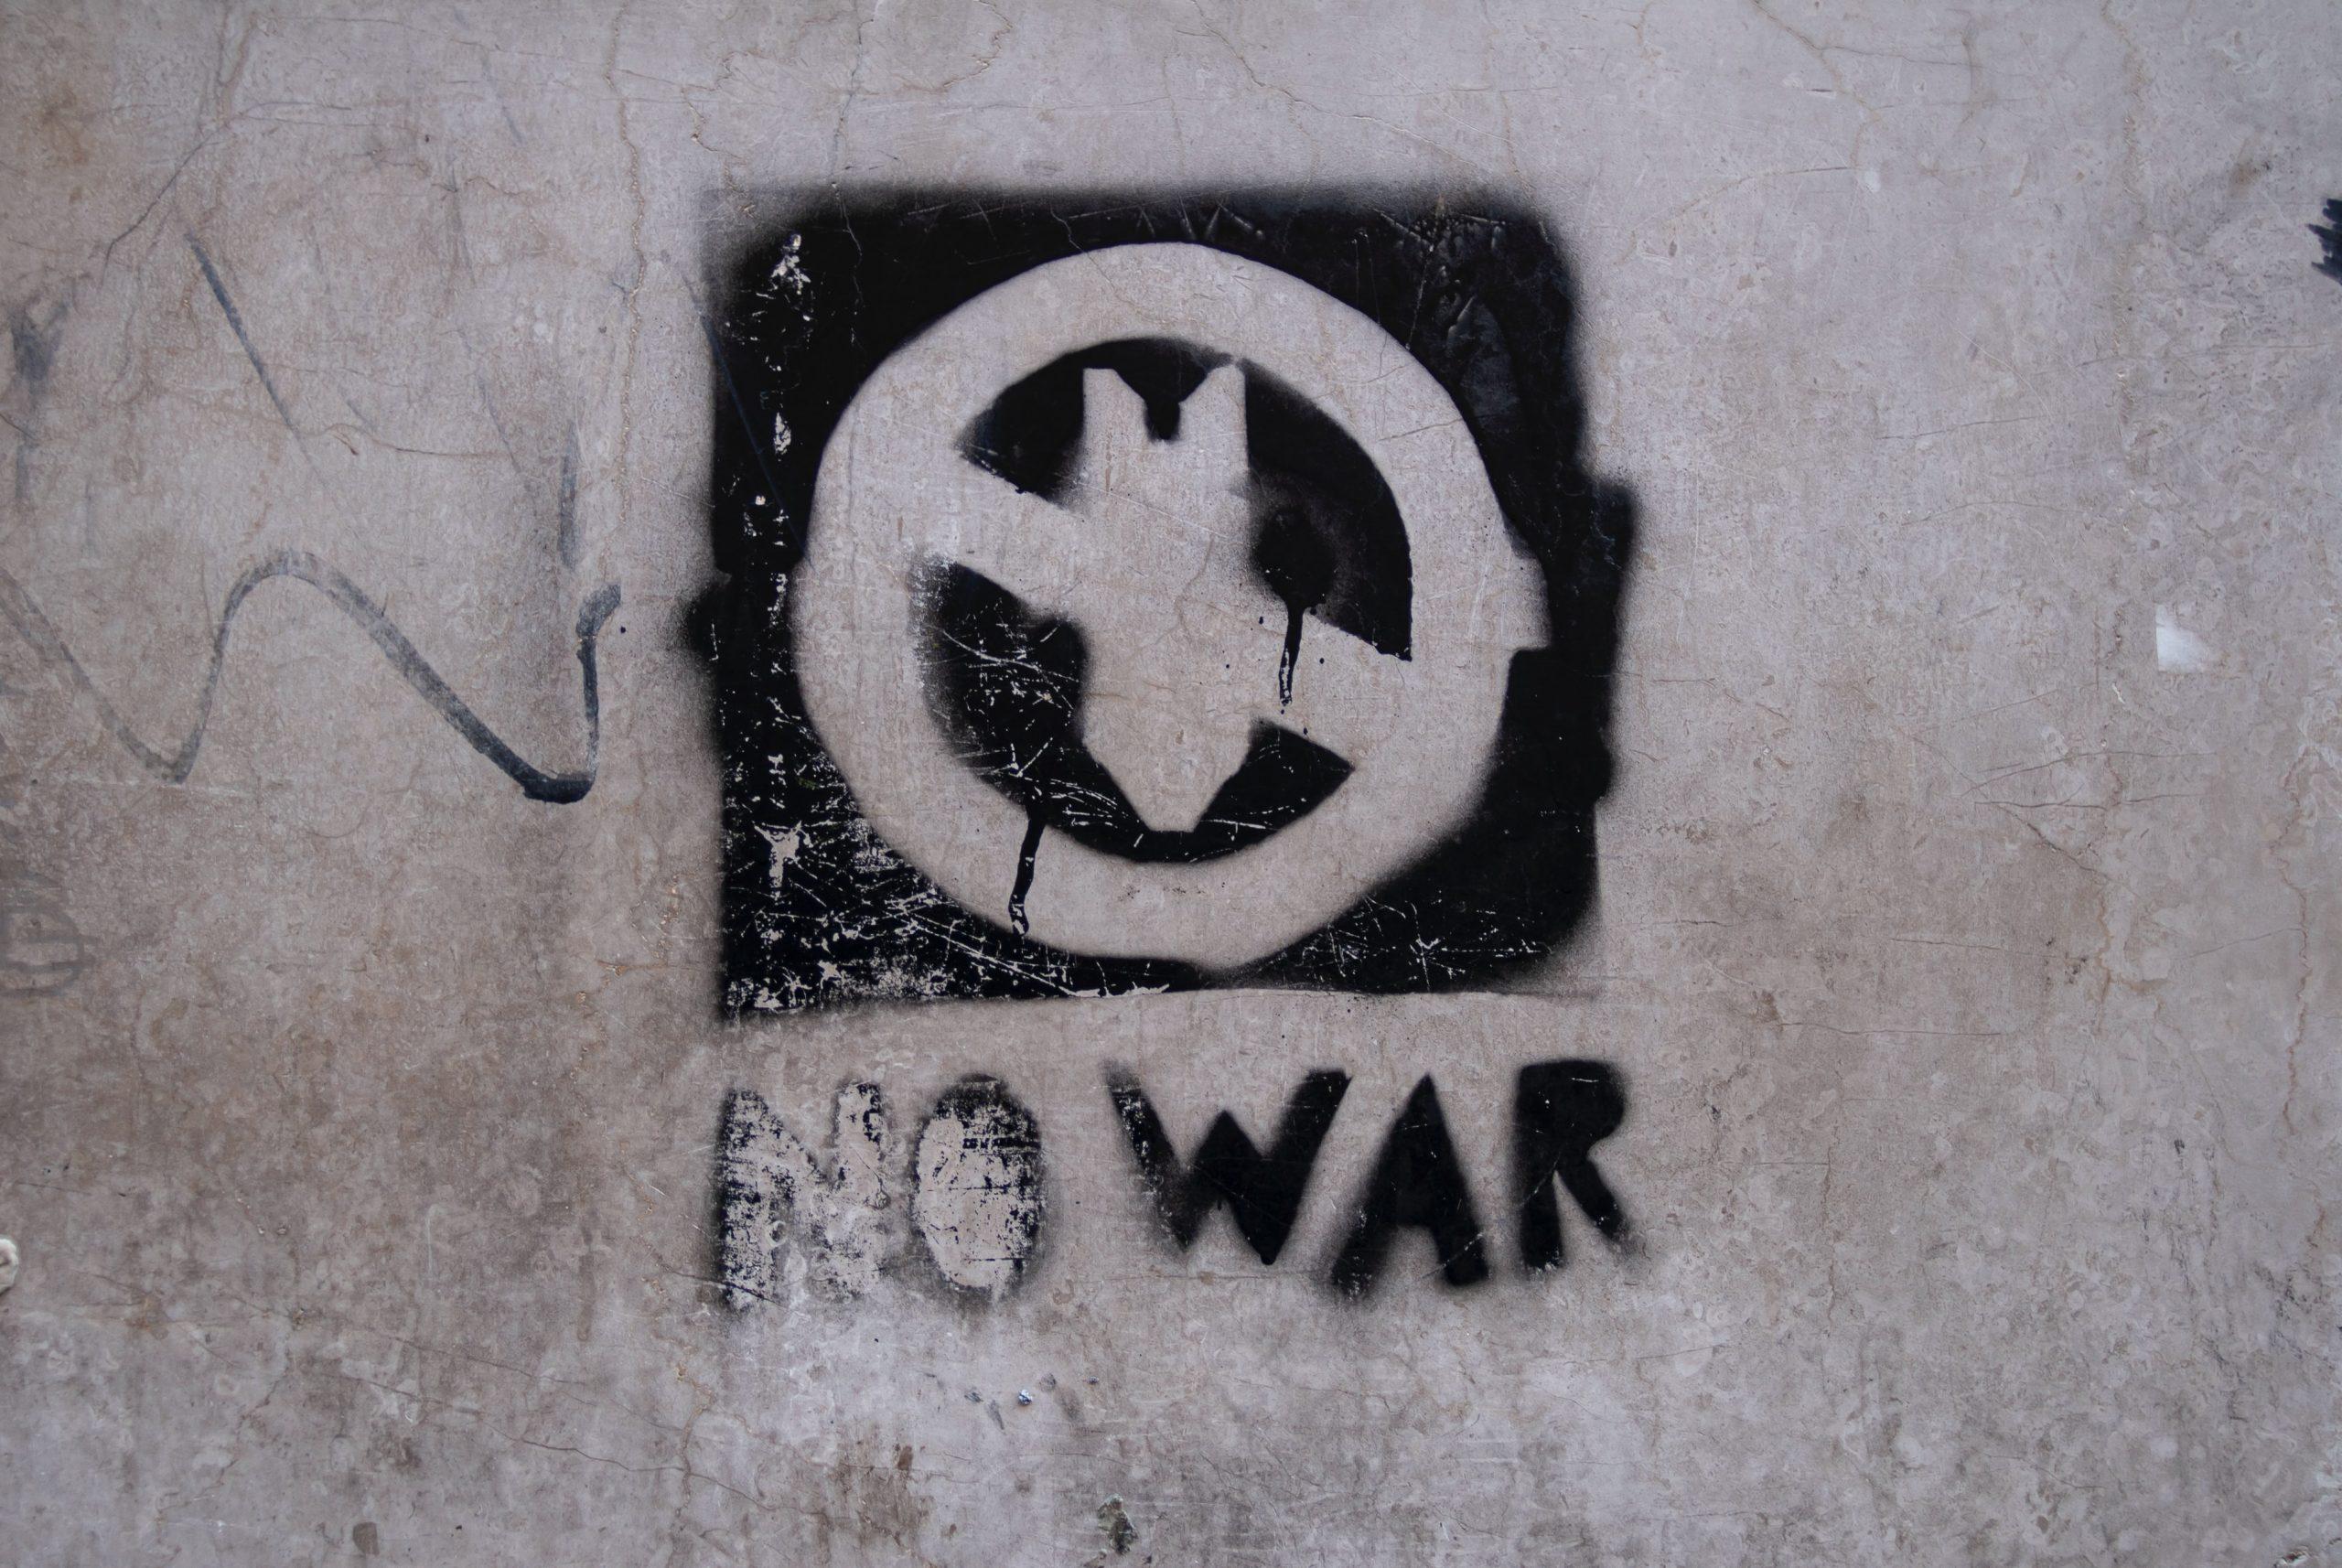 Banning Nuclear Weapons - An Auspicious Start